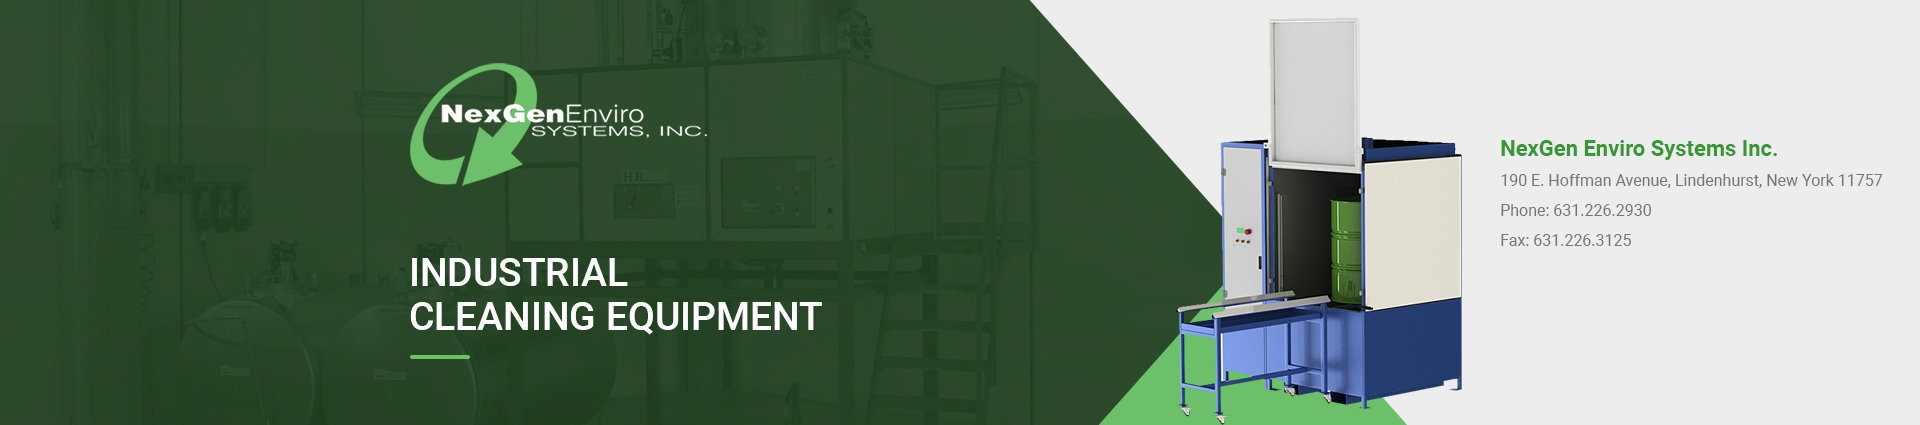 industrial-cleaning-equipment banner NexGen Enviro Systems Inc